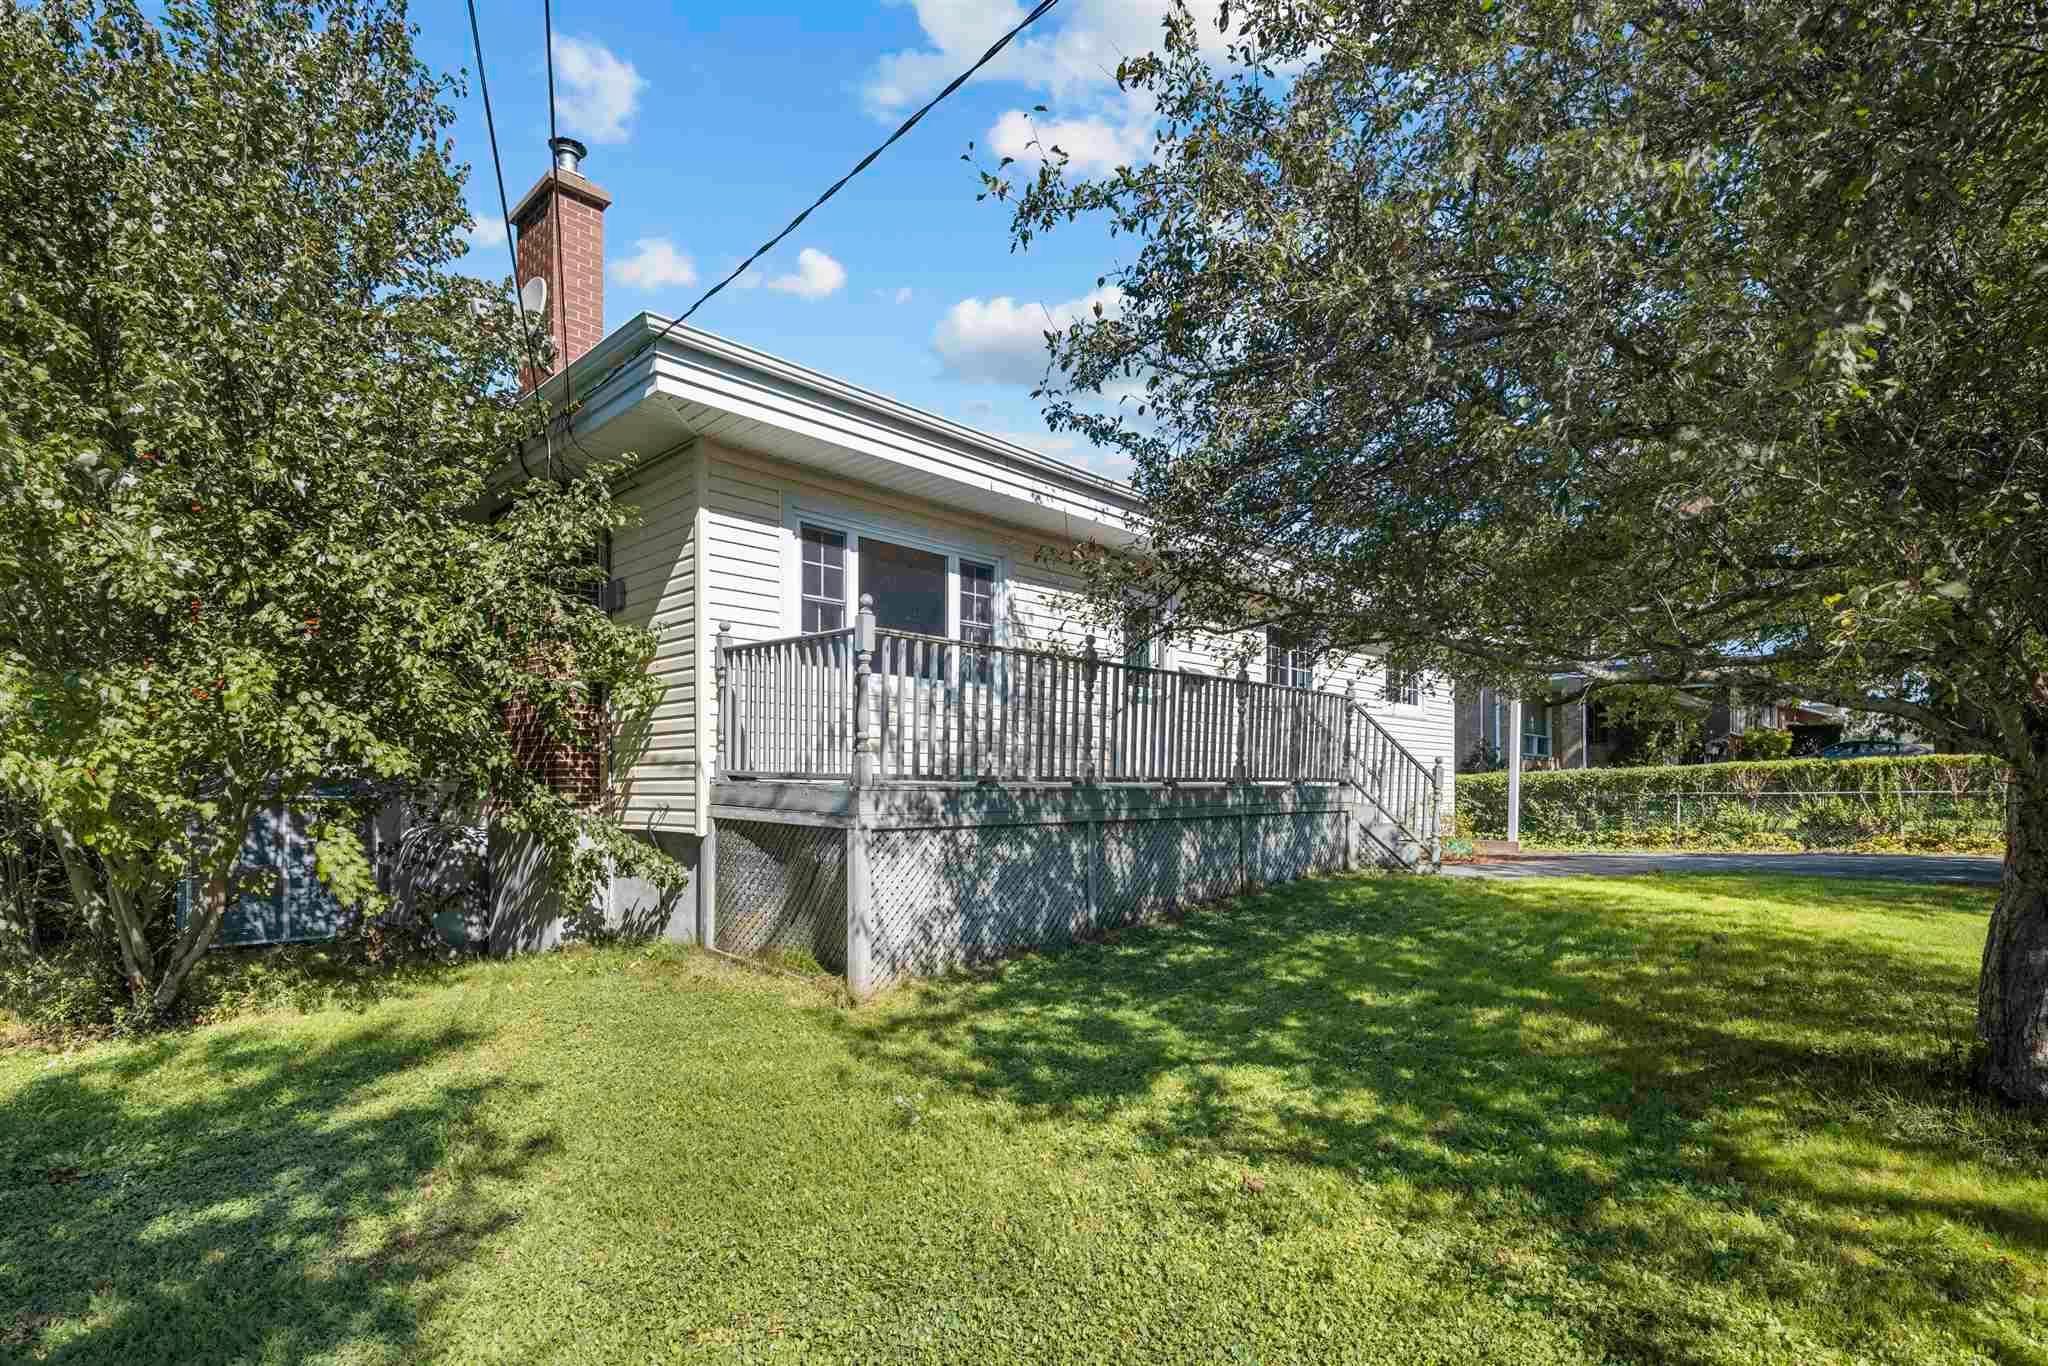 Main Photo: 4 Raymond Drive in Lower Sackville: 25-Sackville Residential for sale (Halifax-Dartmouth)  : MLS®# 202123484